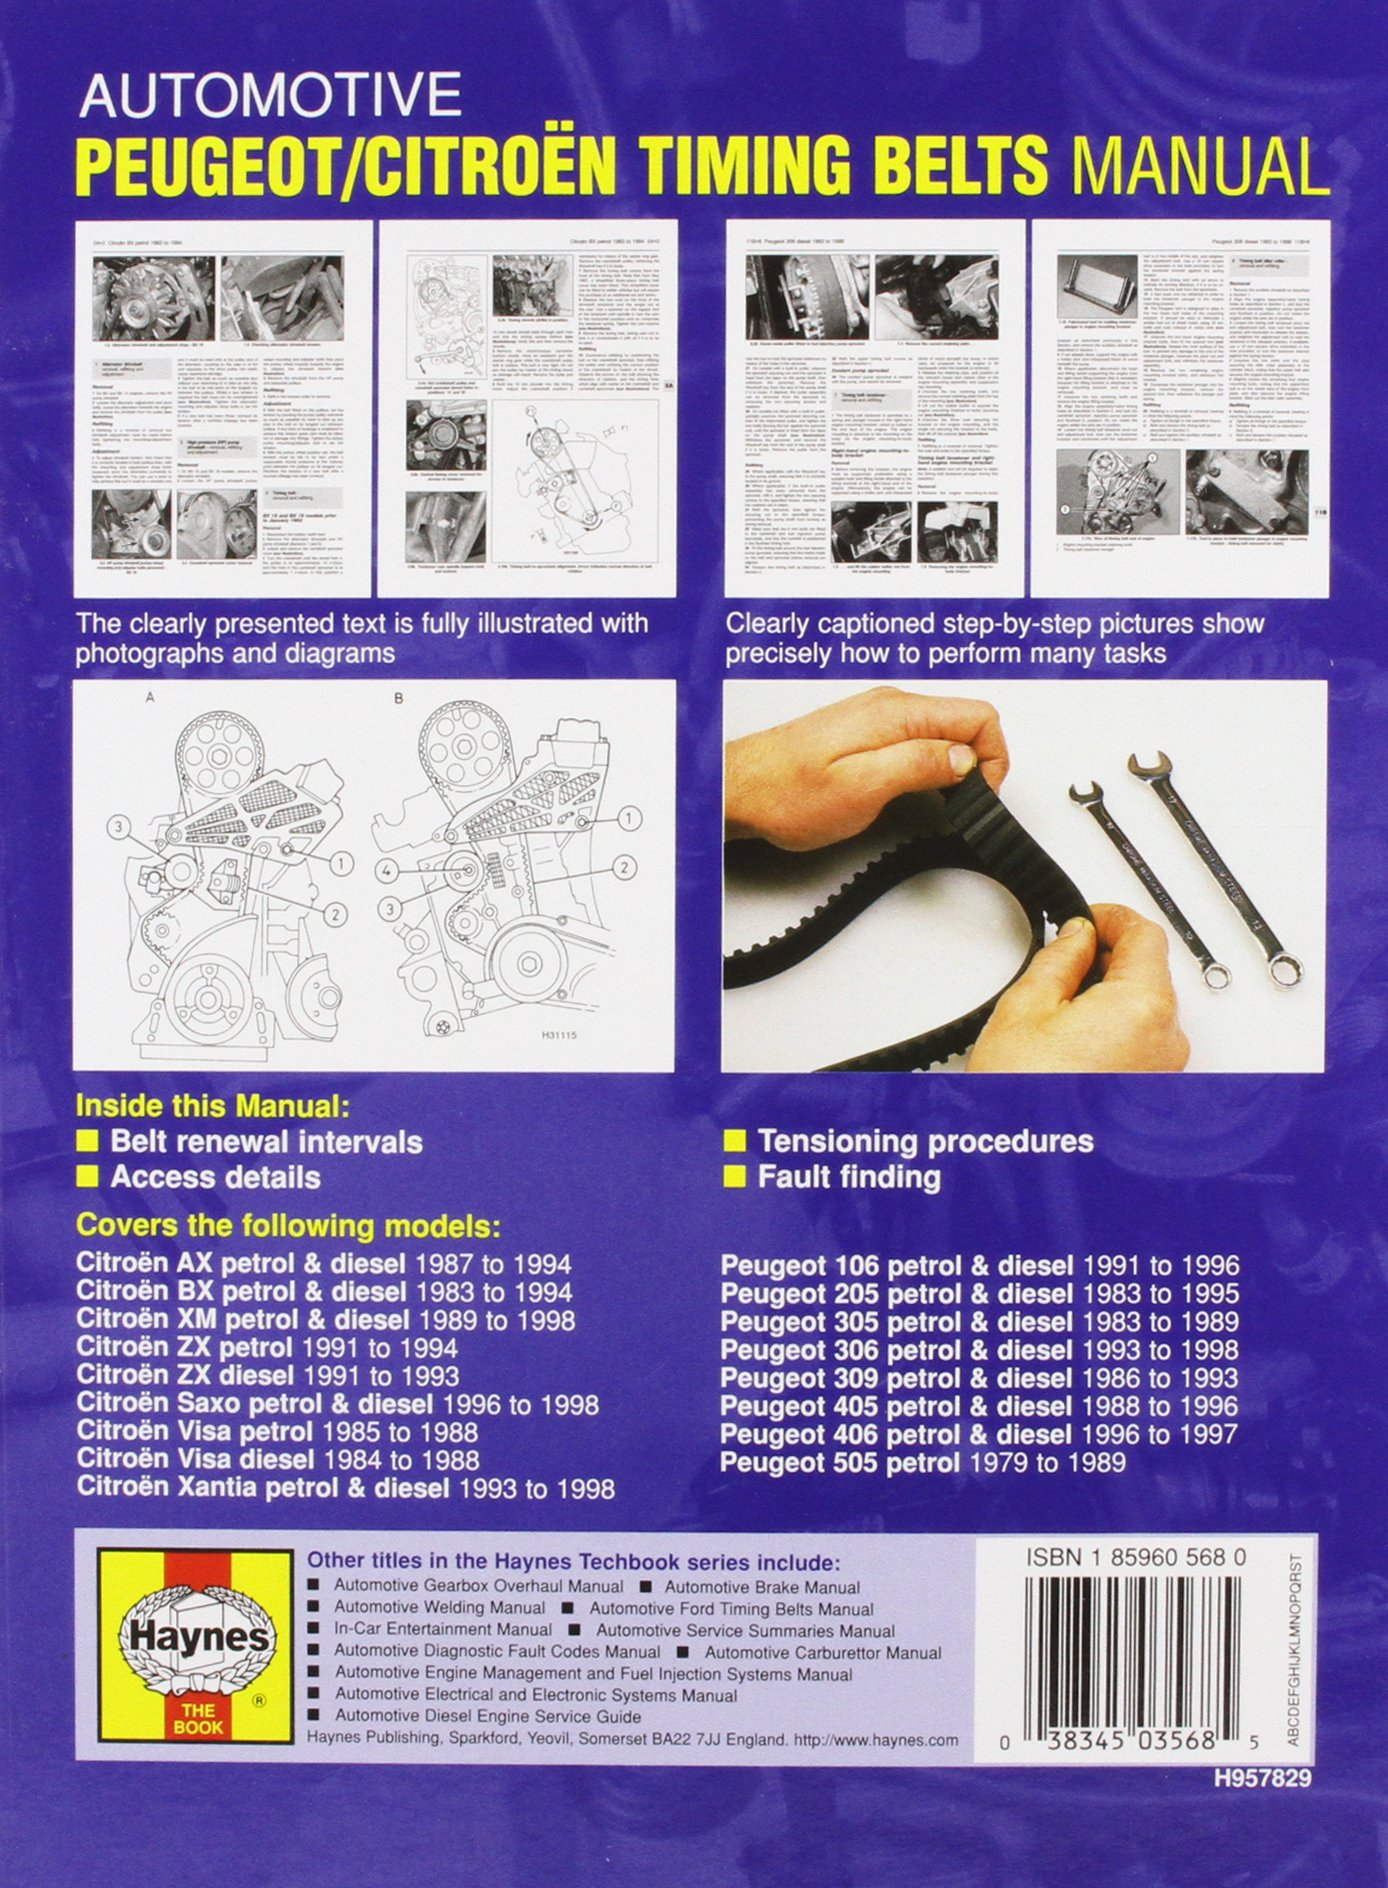 Automotive Peugeot/Citroen Timing Belts Manual (Haynes Techbooks): Ian  Barnes: 9781859605684: Amazon.com: Books